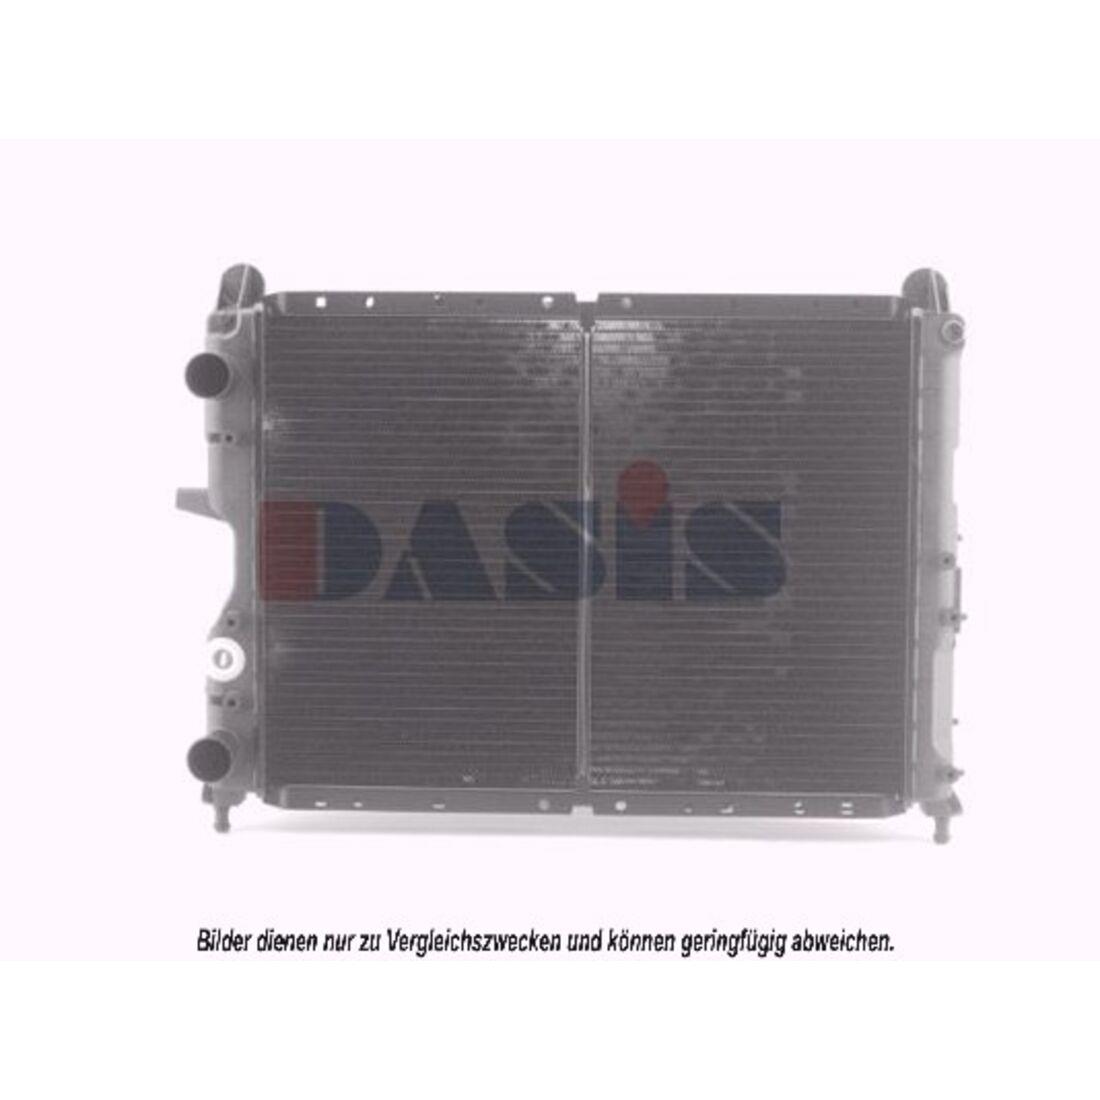 Kühler, Motorkühlung -- AKS DASIS, ALFA ROMEO, 155 (167)...